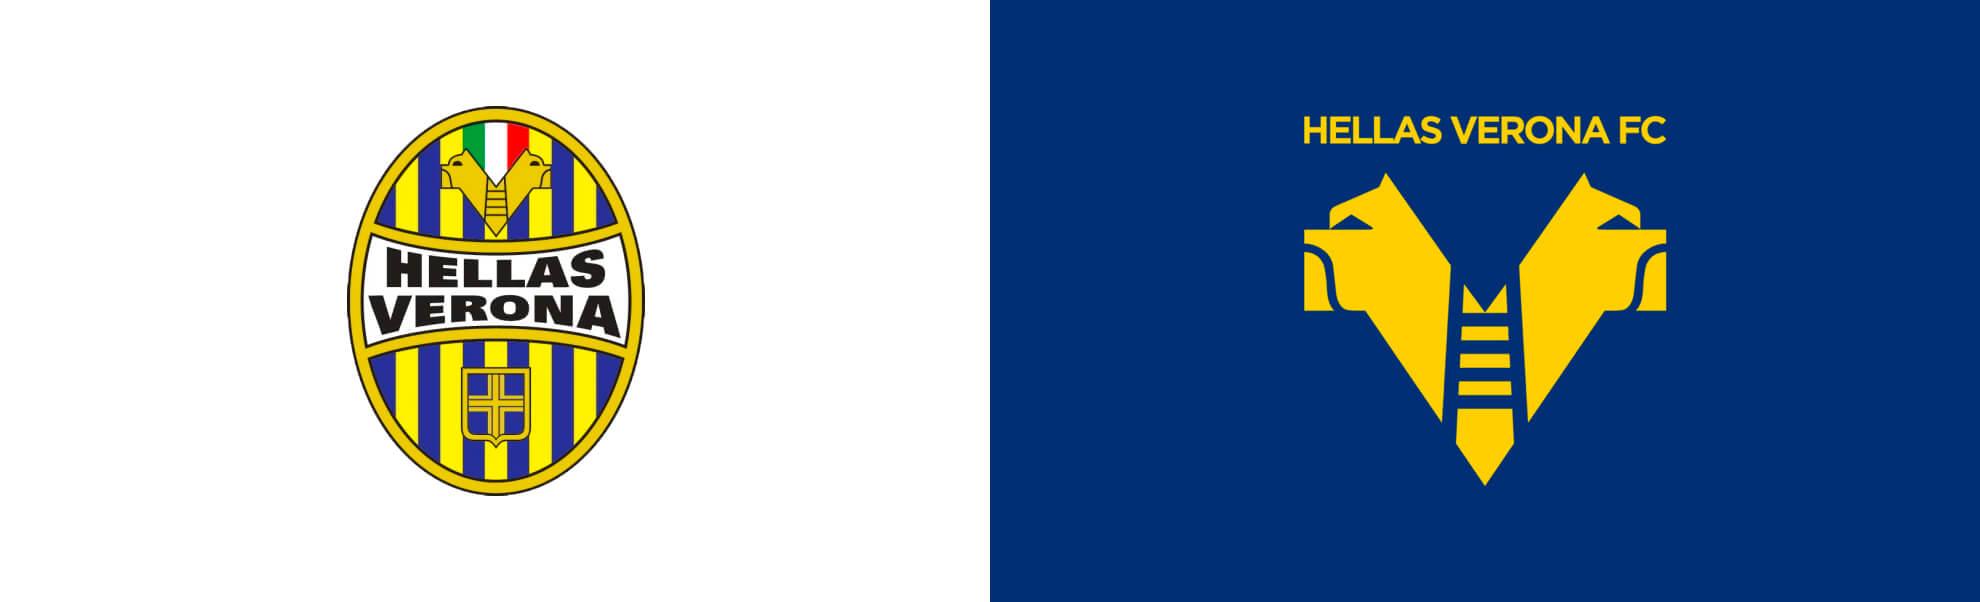 Hellas Werona znowym logo